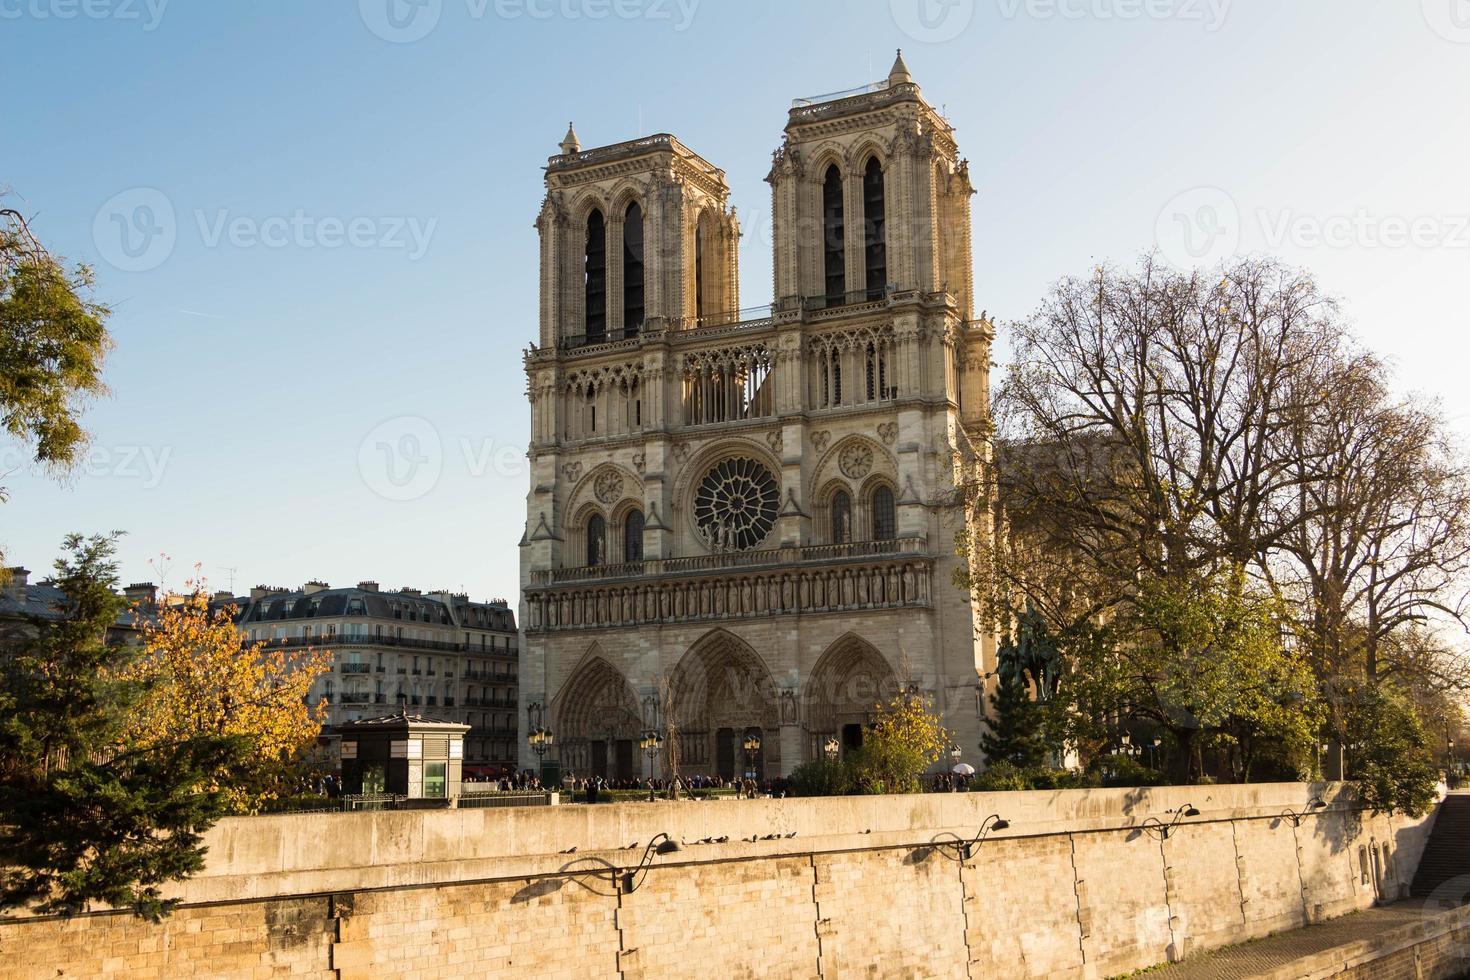 la cattedrale di notre dame, parigi, francia. foto